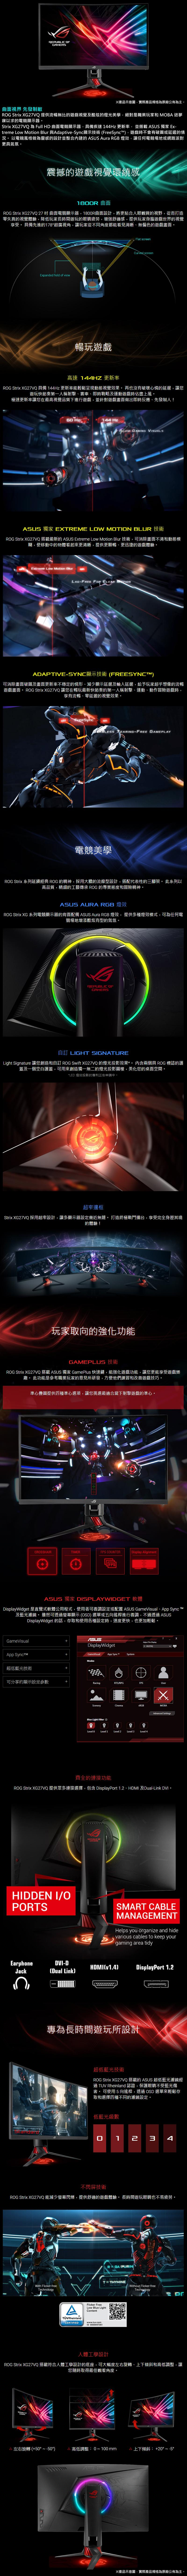 快速出貨【UH 3C】ASUS 華碩 ROG Strix XG27-VQ 曲面電競螢幕 27吋 FHD 144Hz 1m